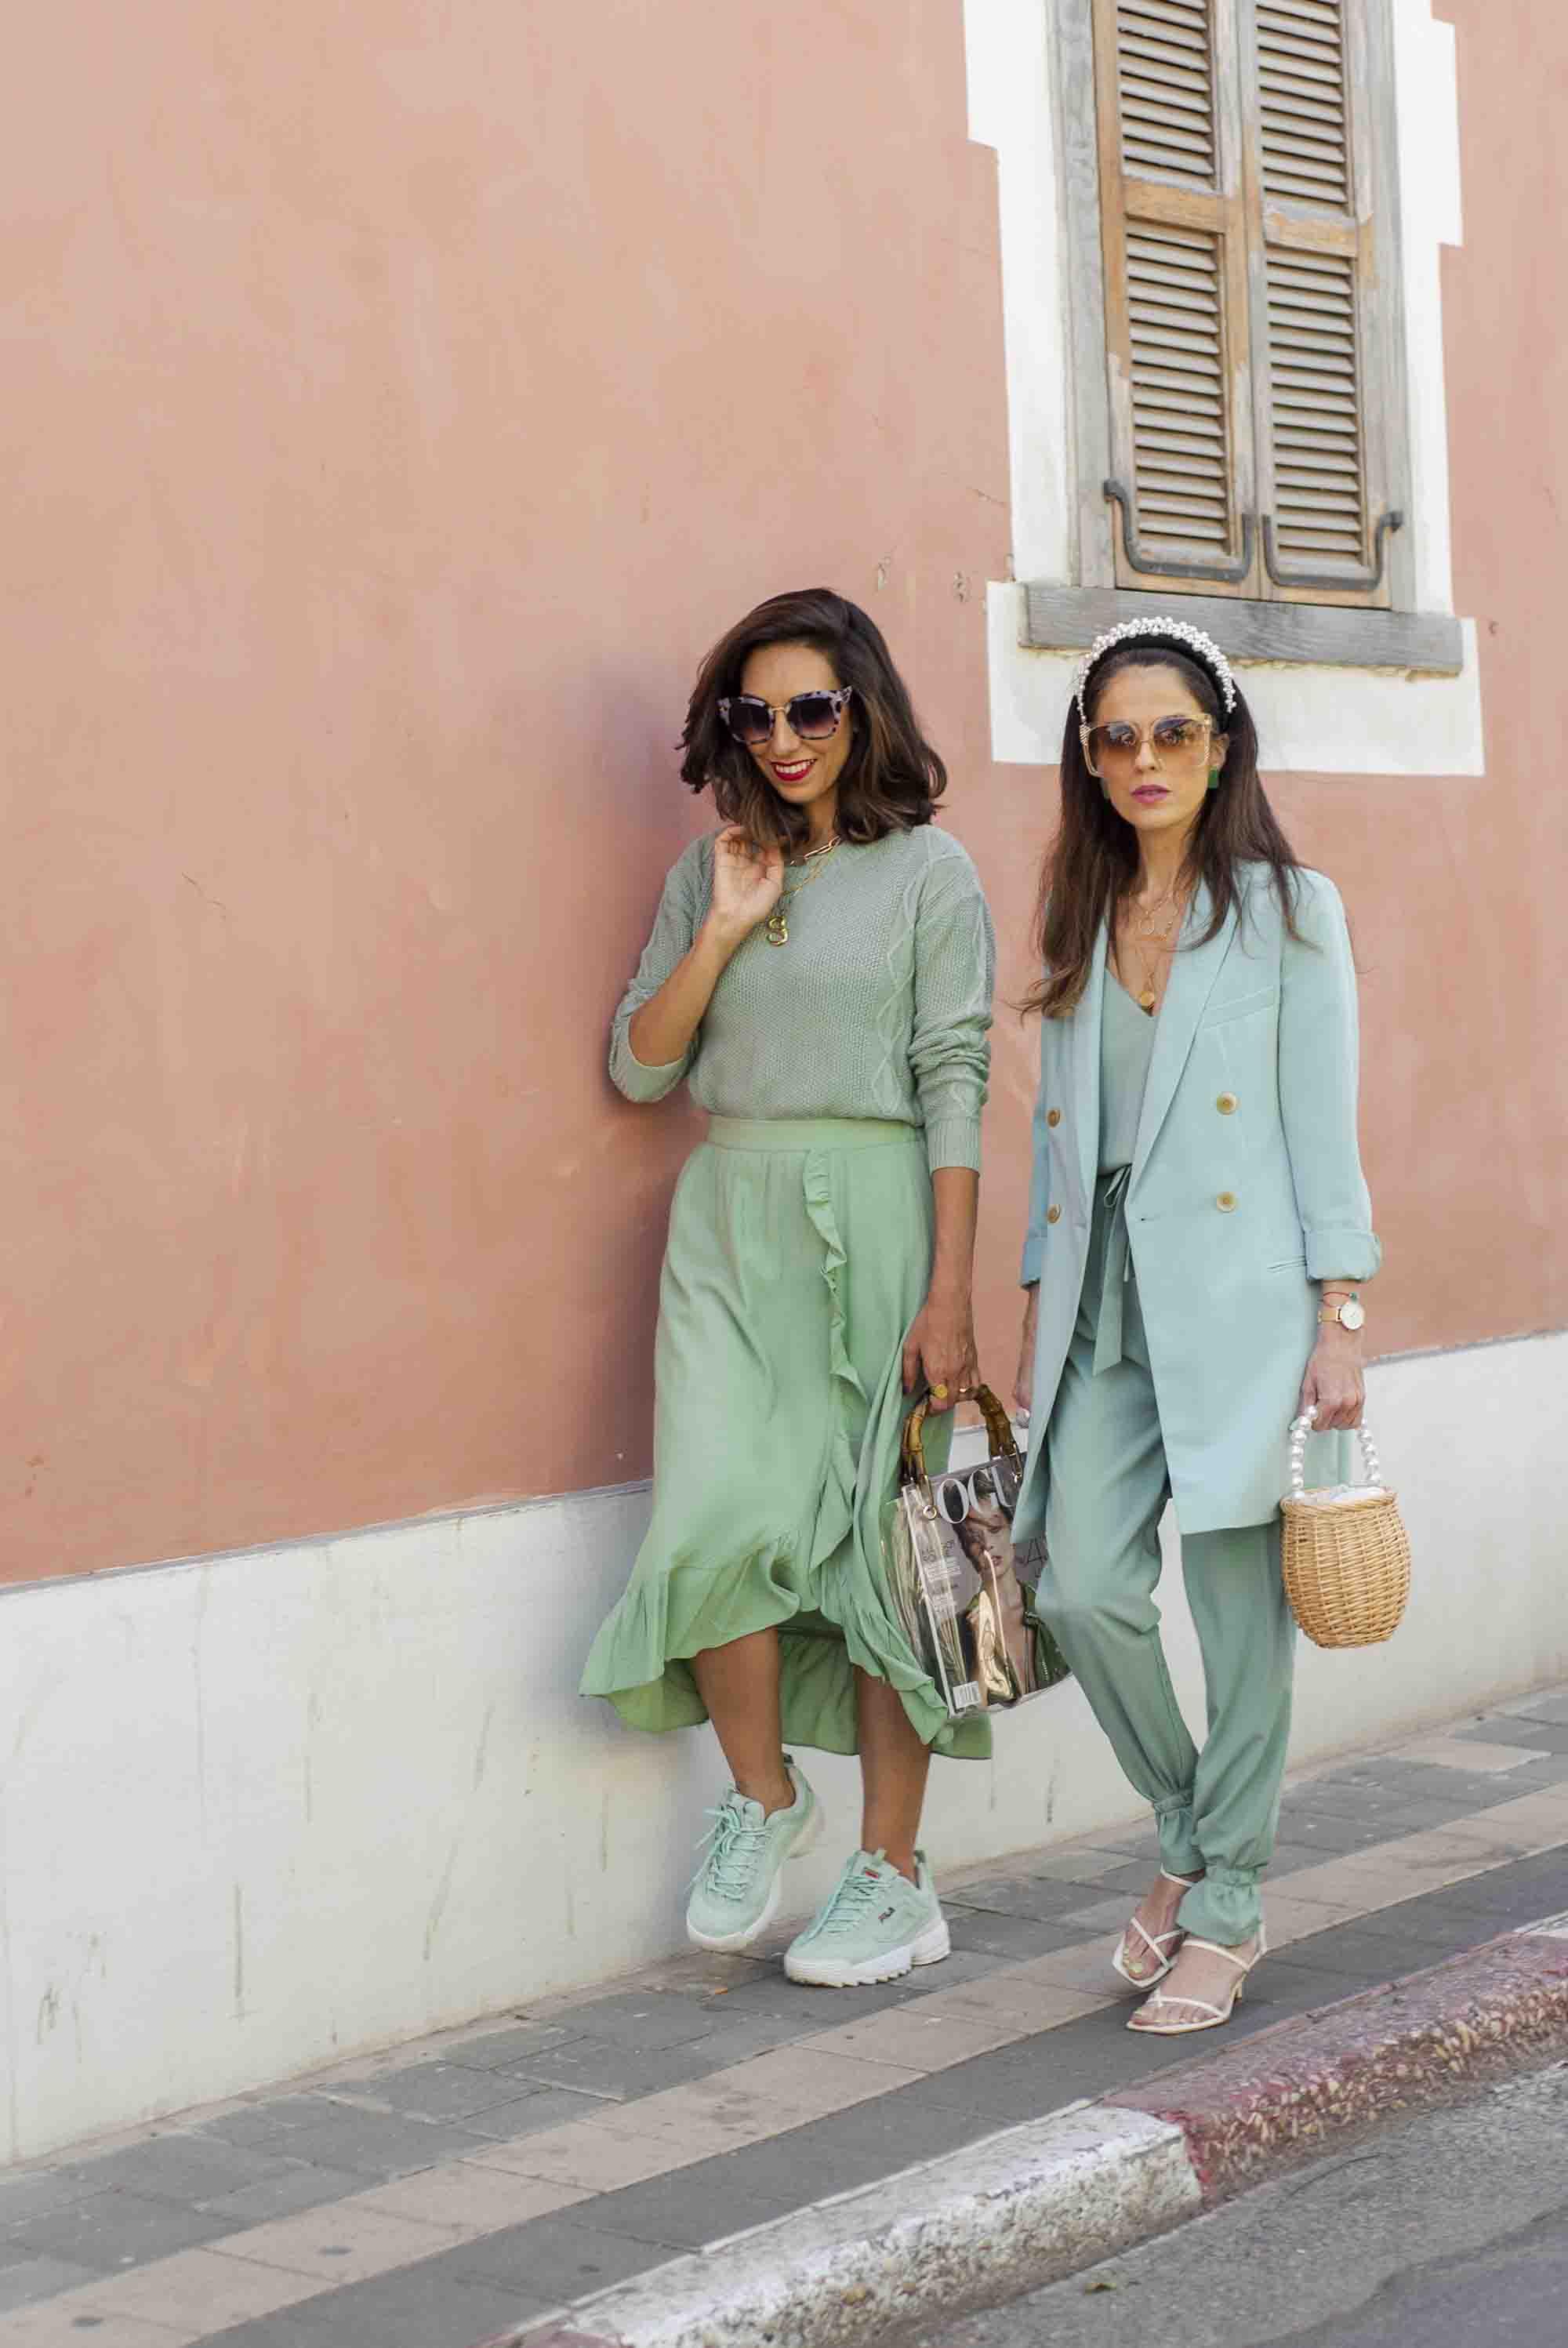 Fashion Israel-מגזין אופנה ישראלי, מירב רום, שגית שליו, צילום לימור יערי - 3